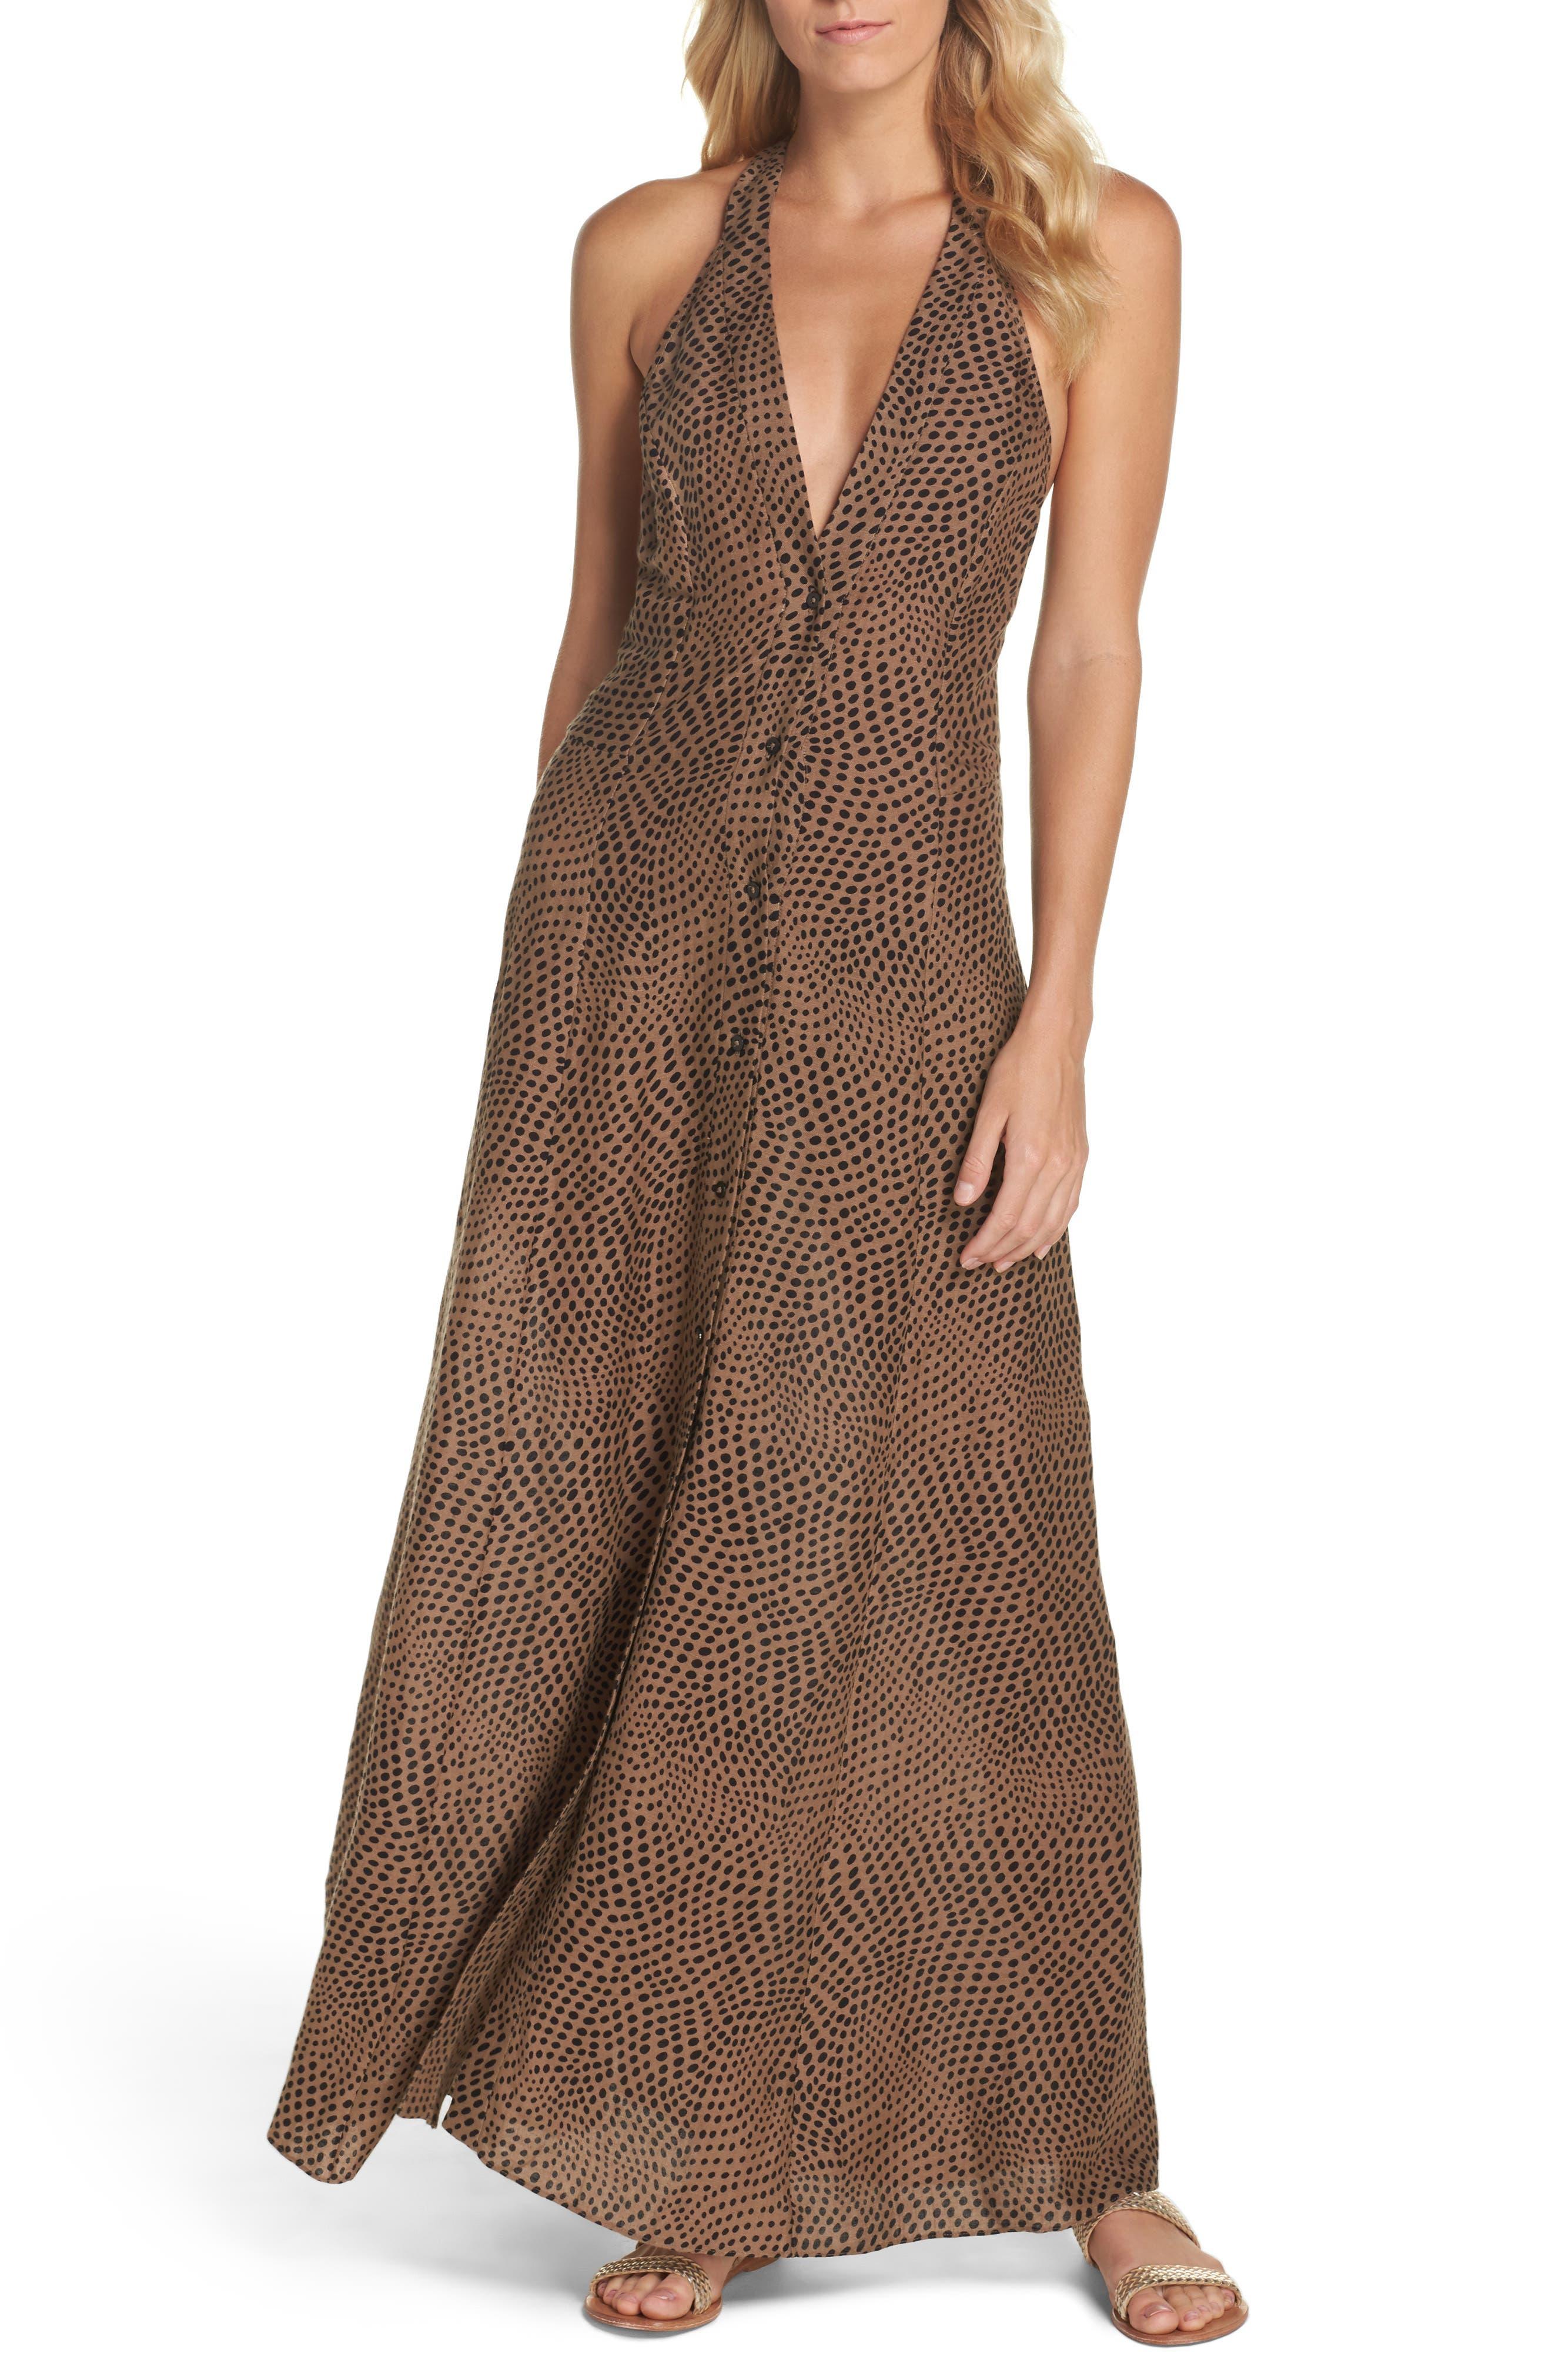 Main Image - Diane von Furstenberg Sleeveless Cover-Up Dress